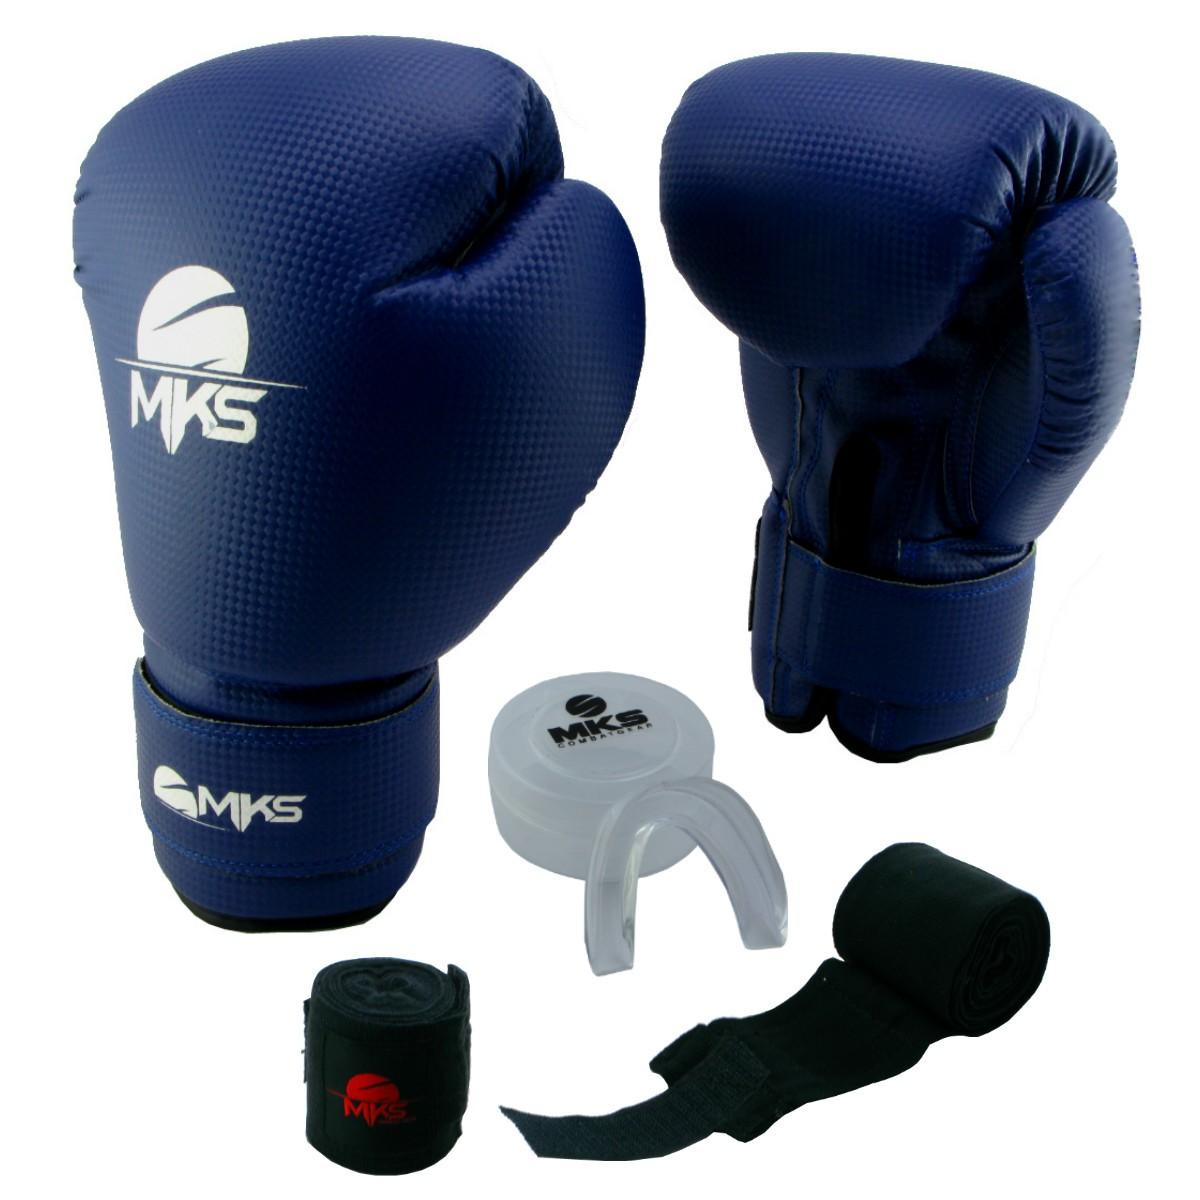 Luva de Boxe Prospect MKS Blue 12 oz + Protetor Bucal + Bandagem